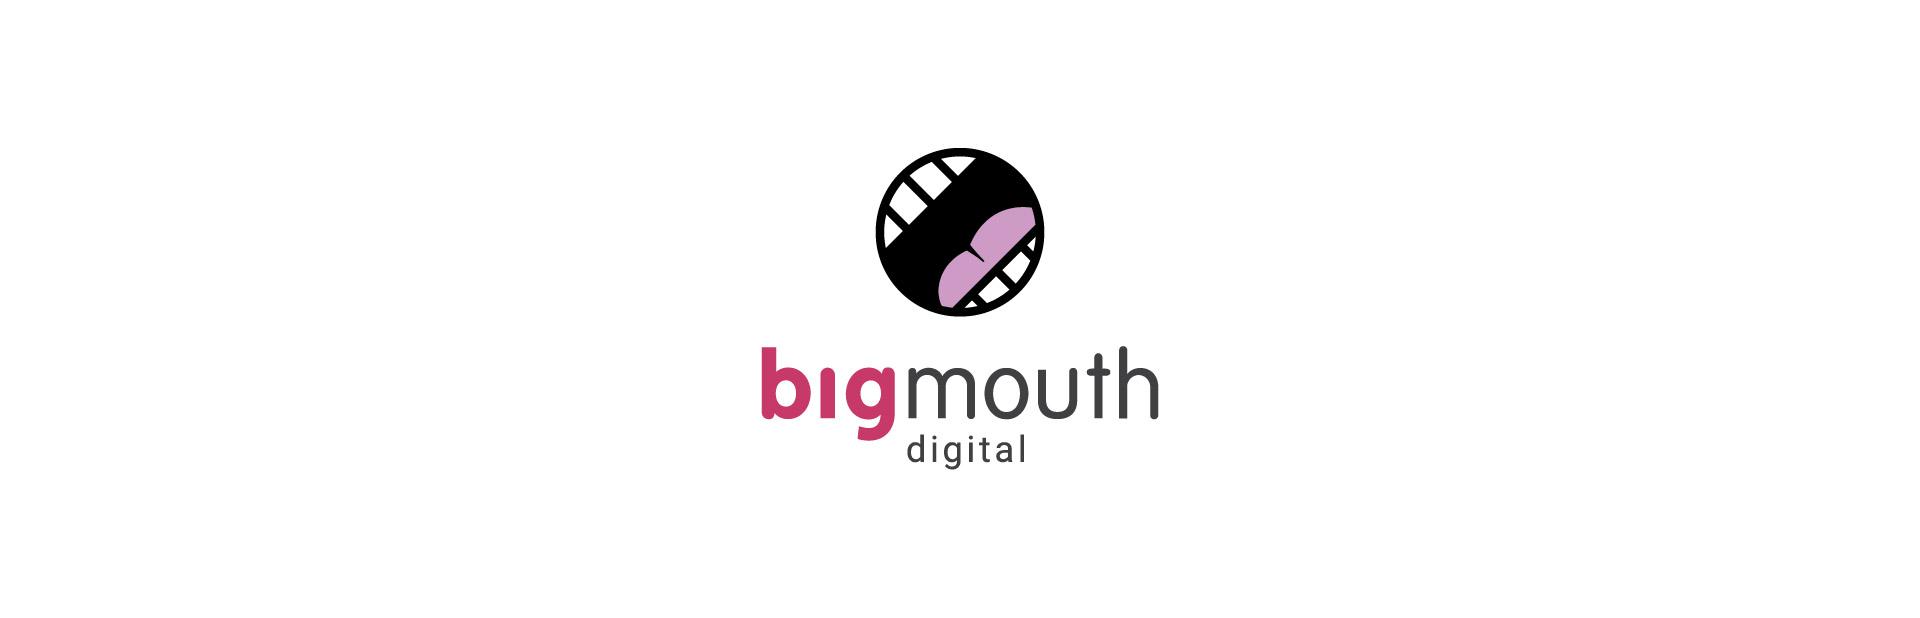 Big Mouth Digital | Paris, France | Social Media Management | 2017